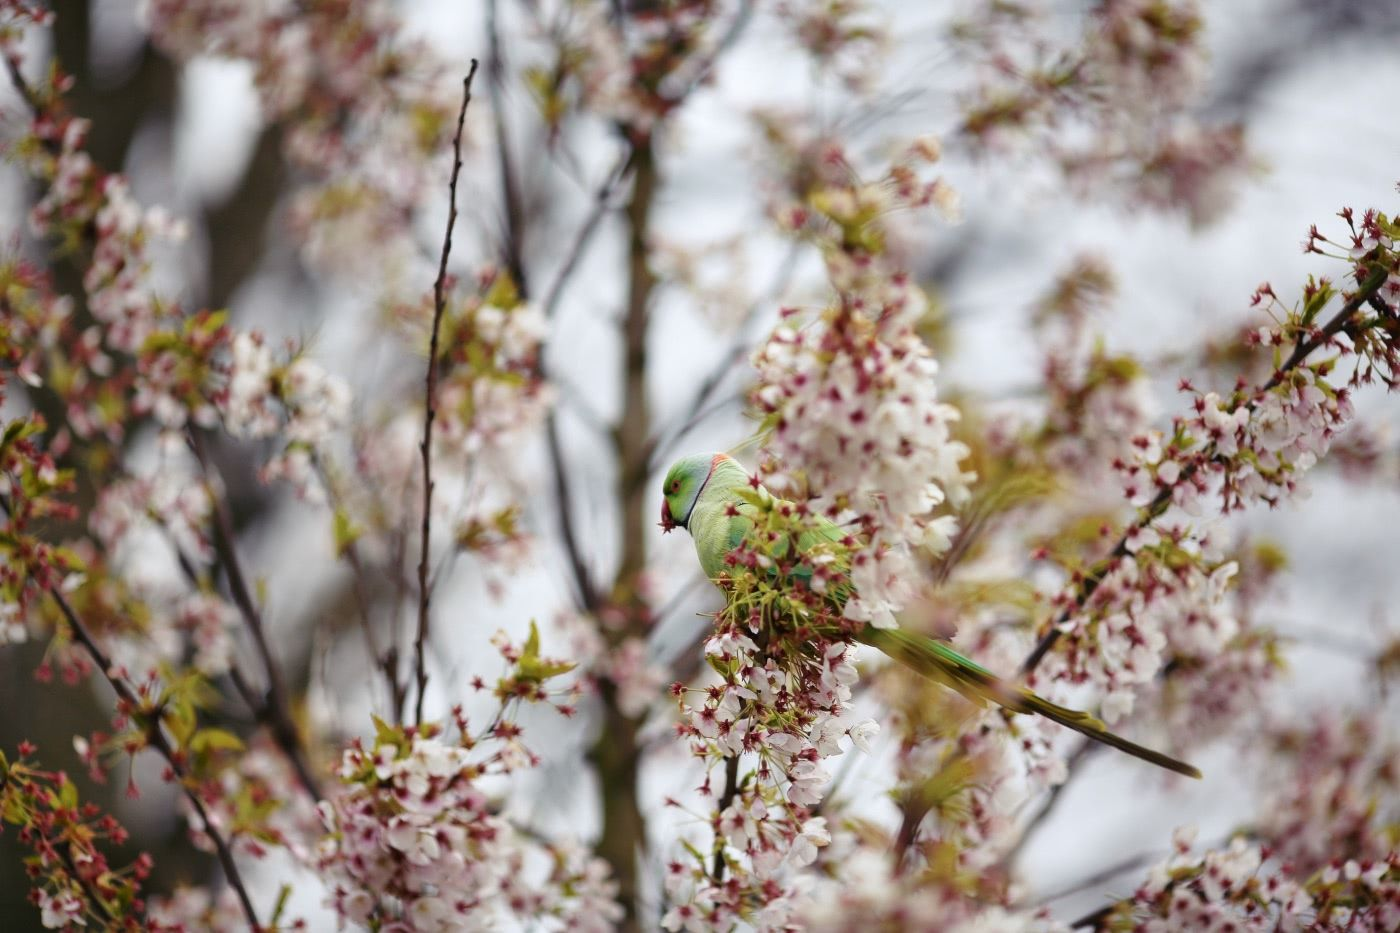 A parakeet amidst cherry blossoms